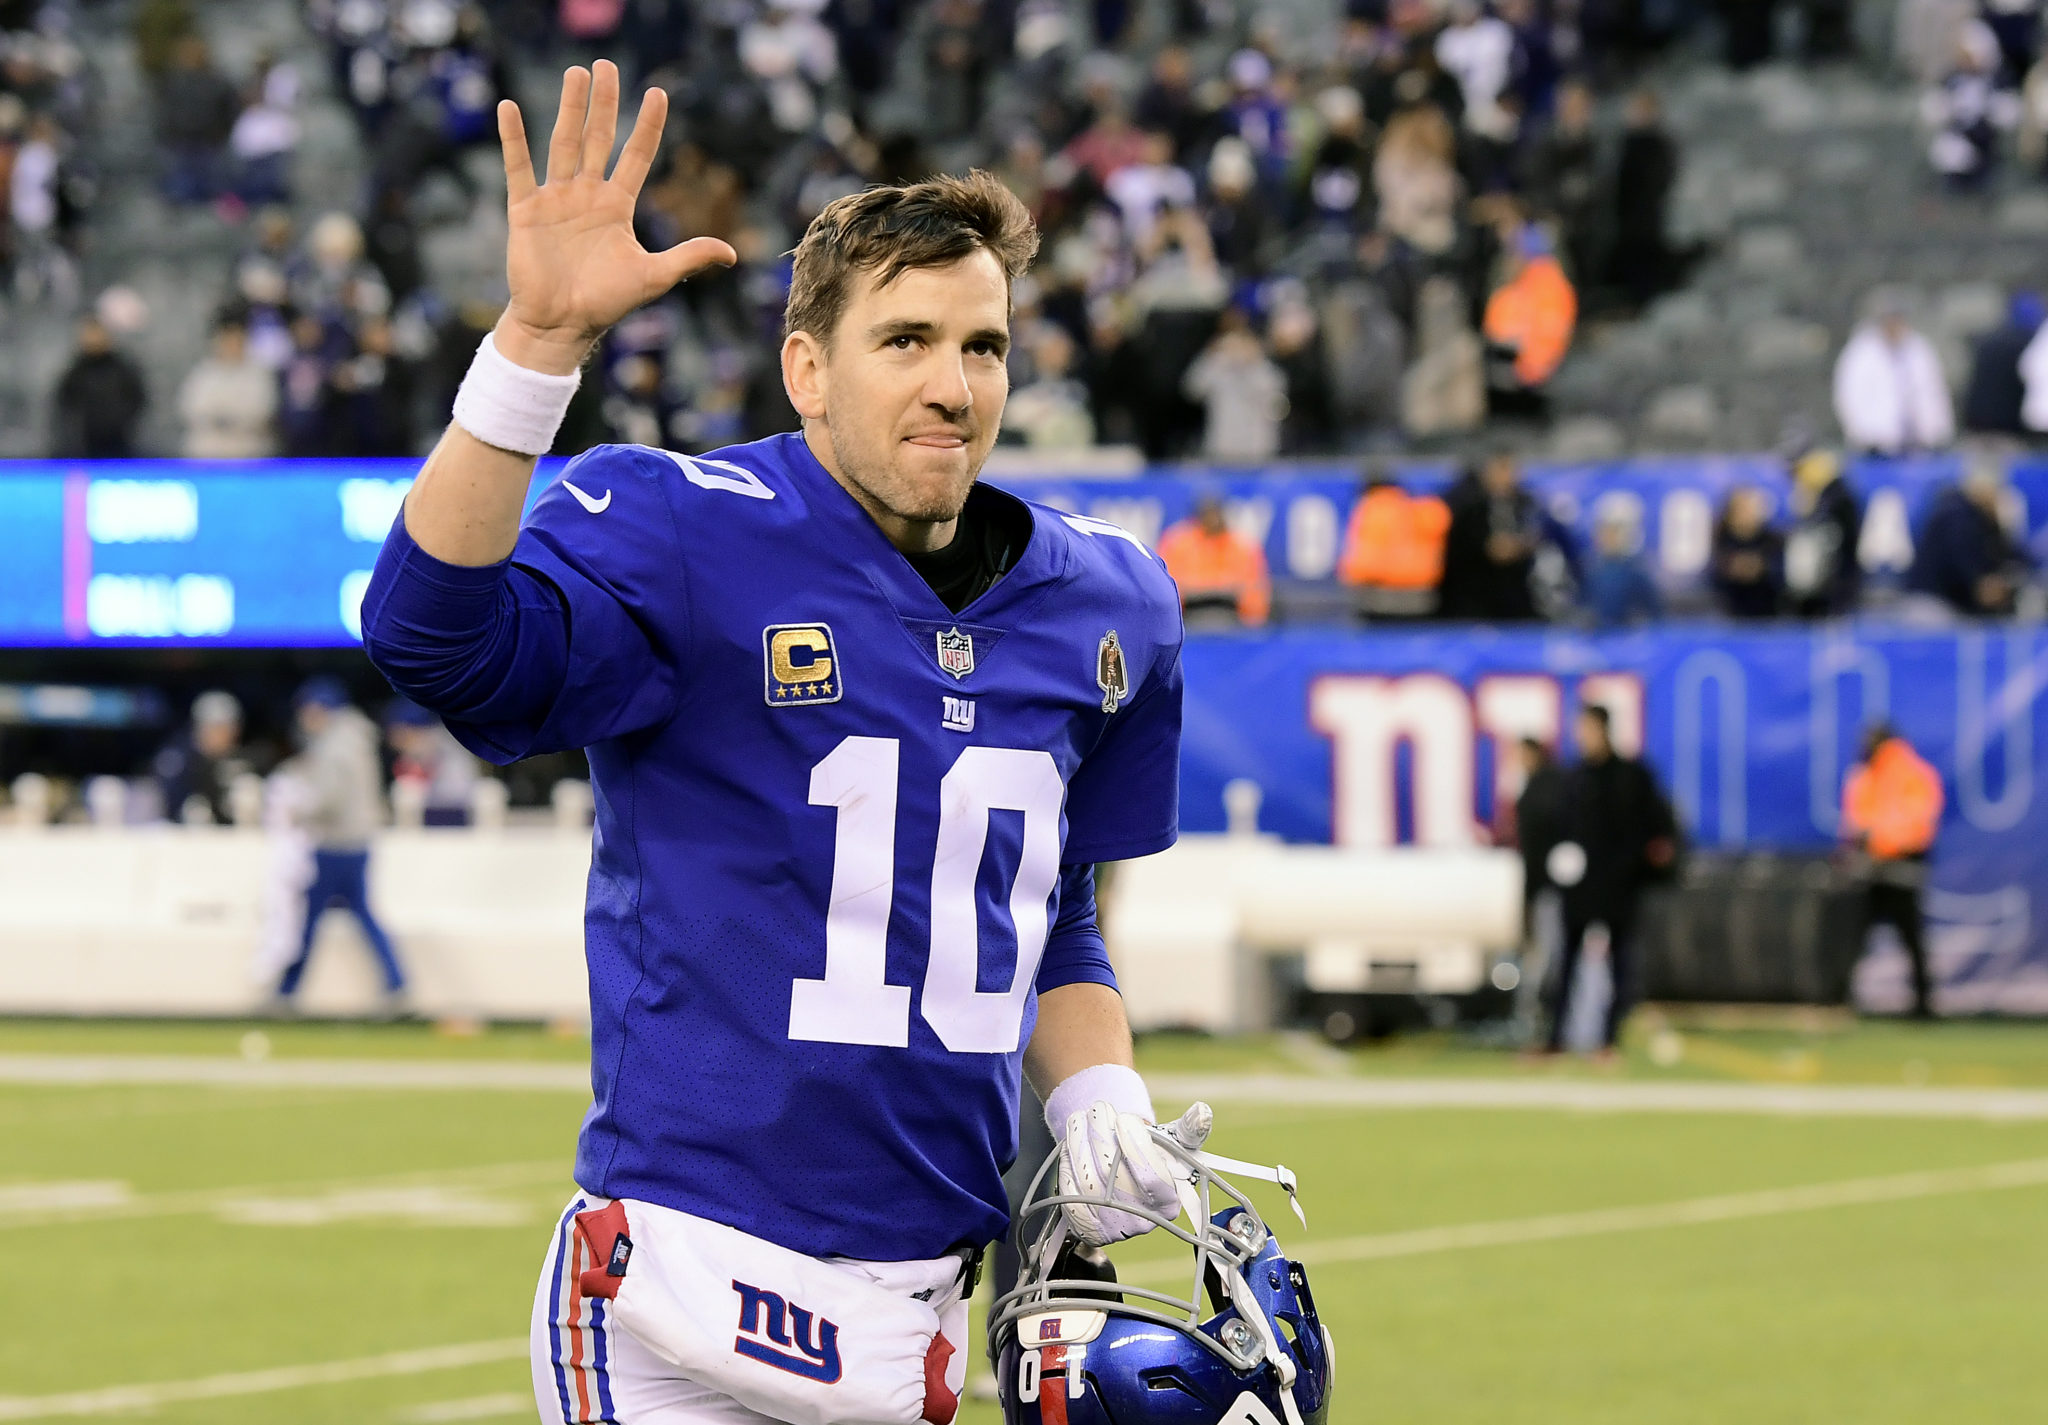 Is Eli Manning a Hall of Famer